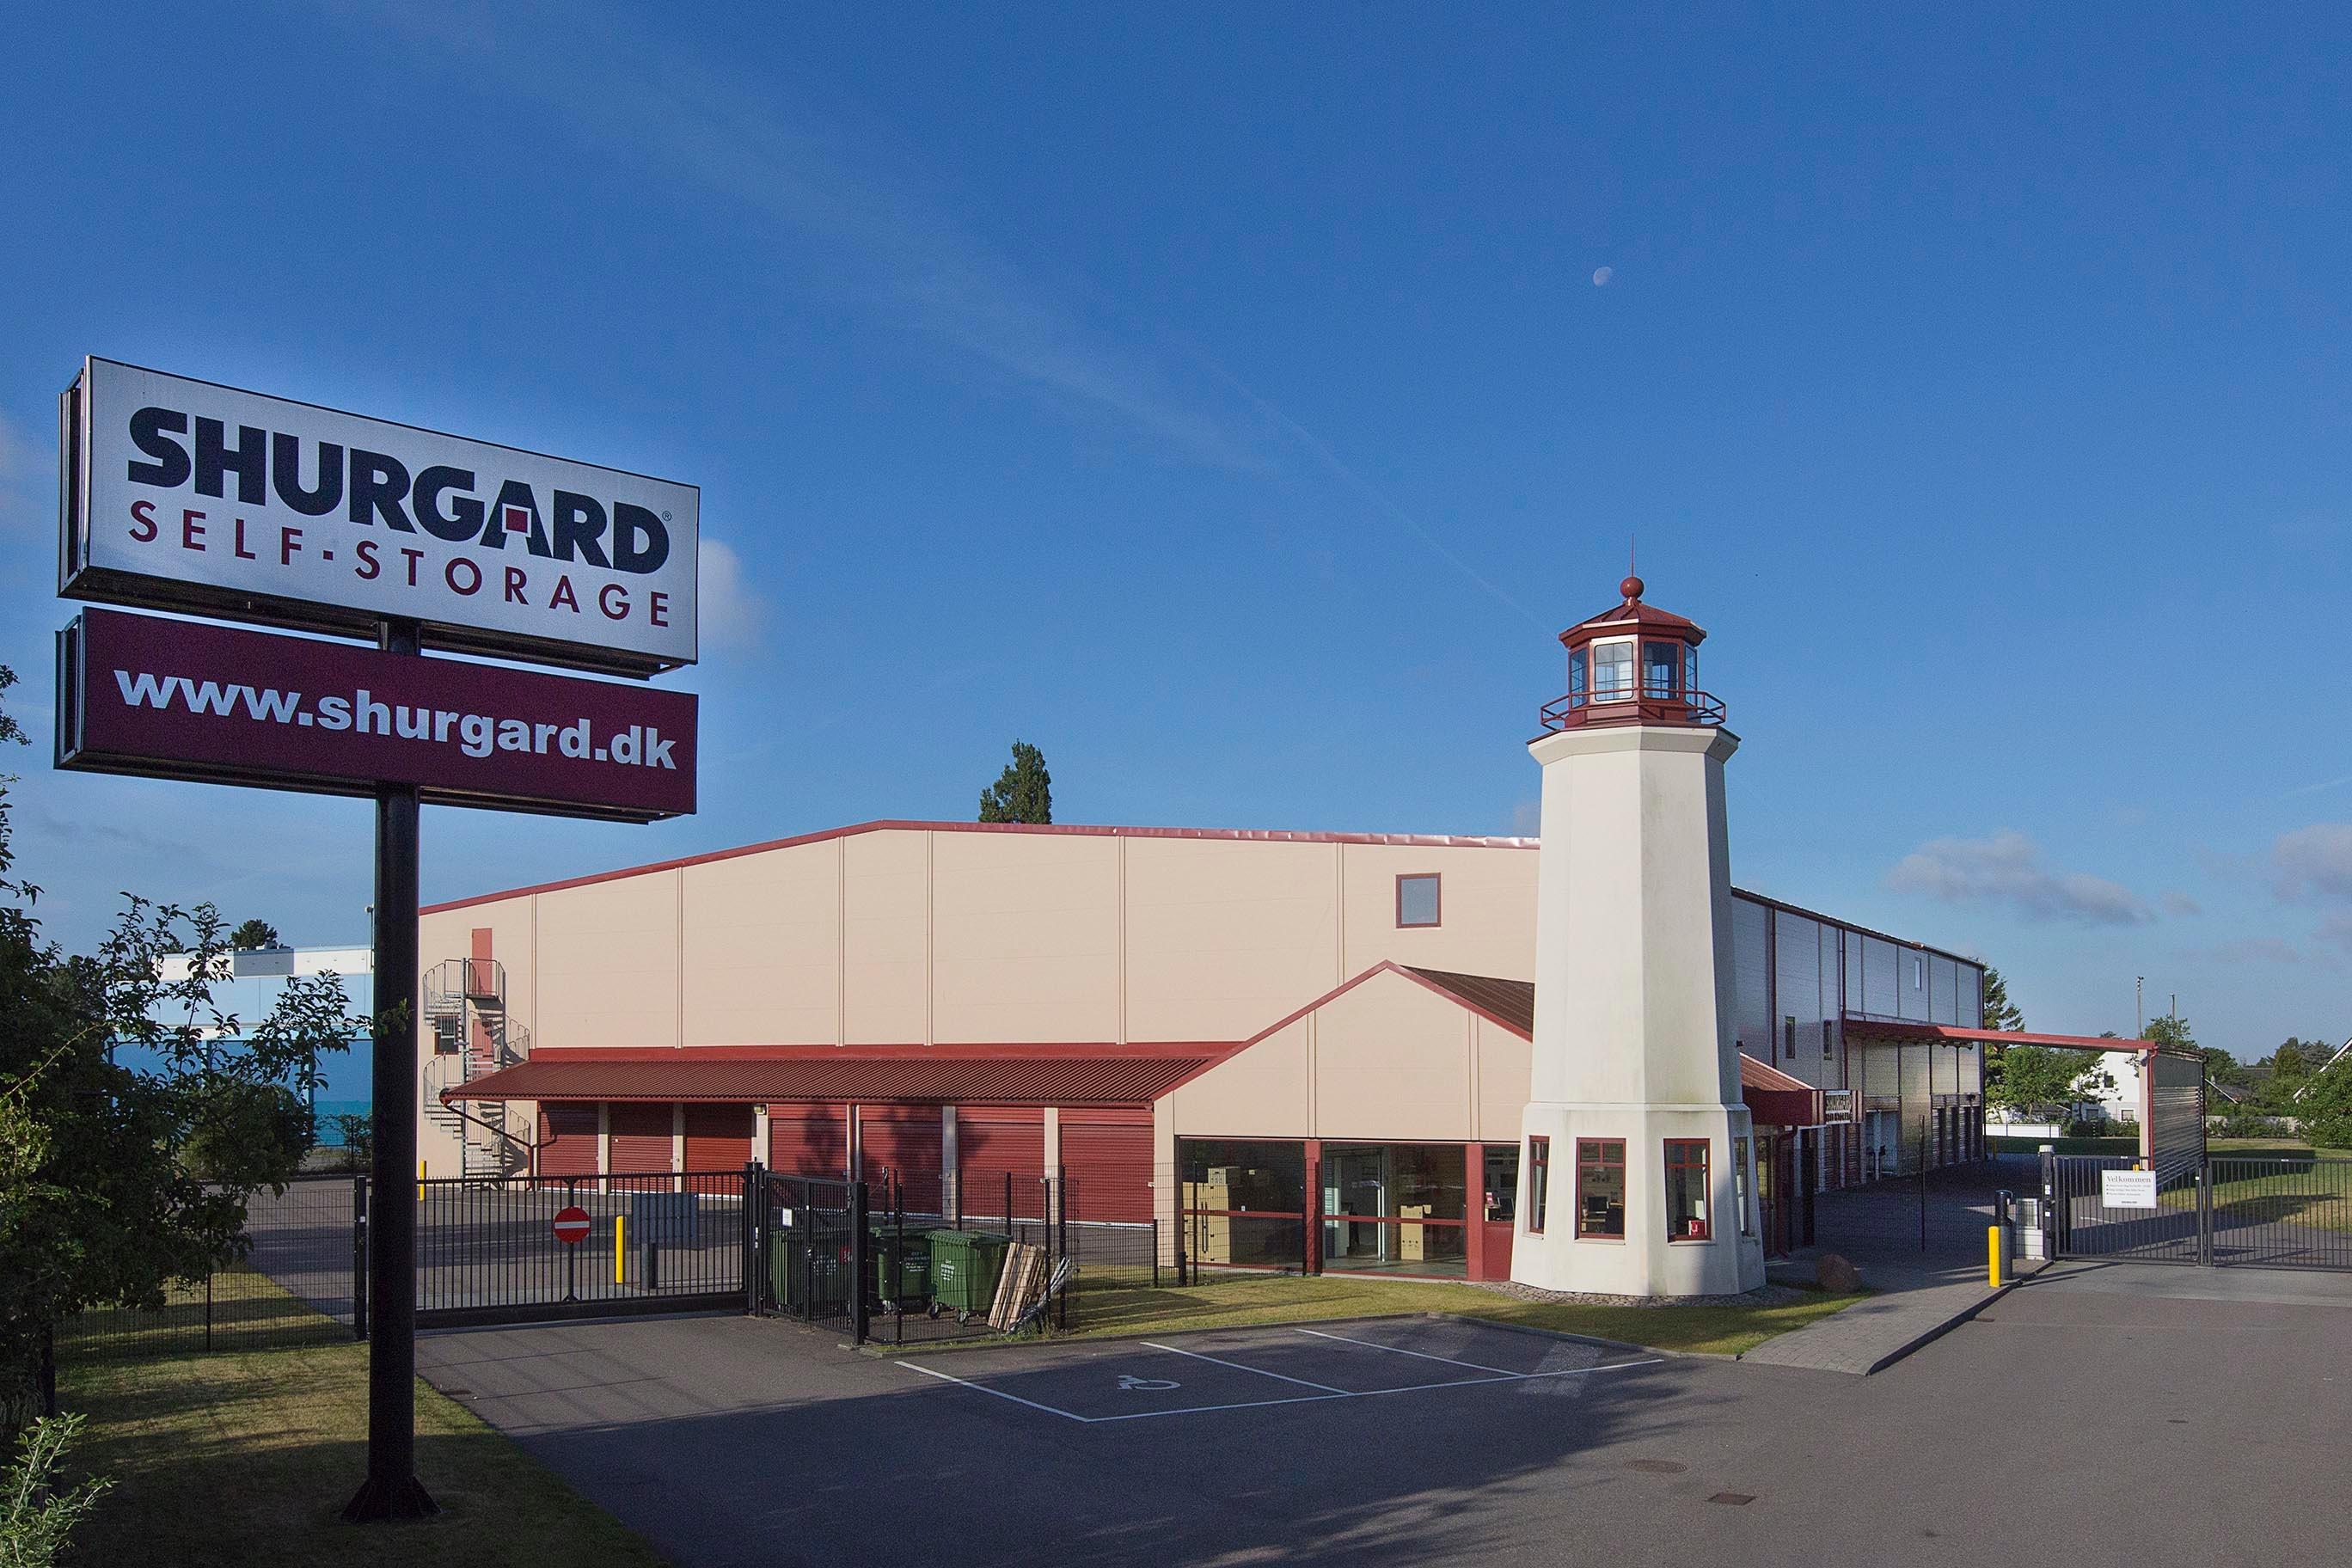 Shurgard Self-Storage Brøndby - Glostrup